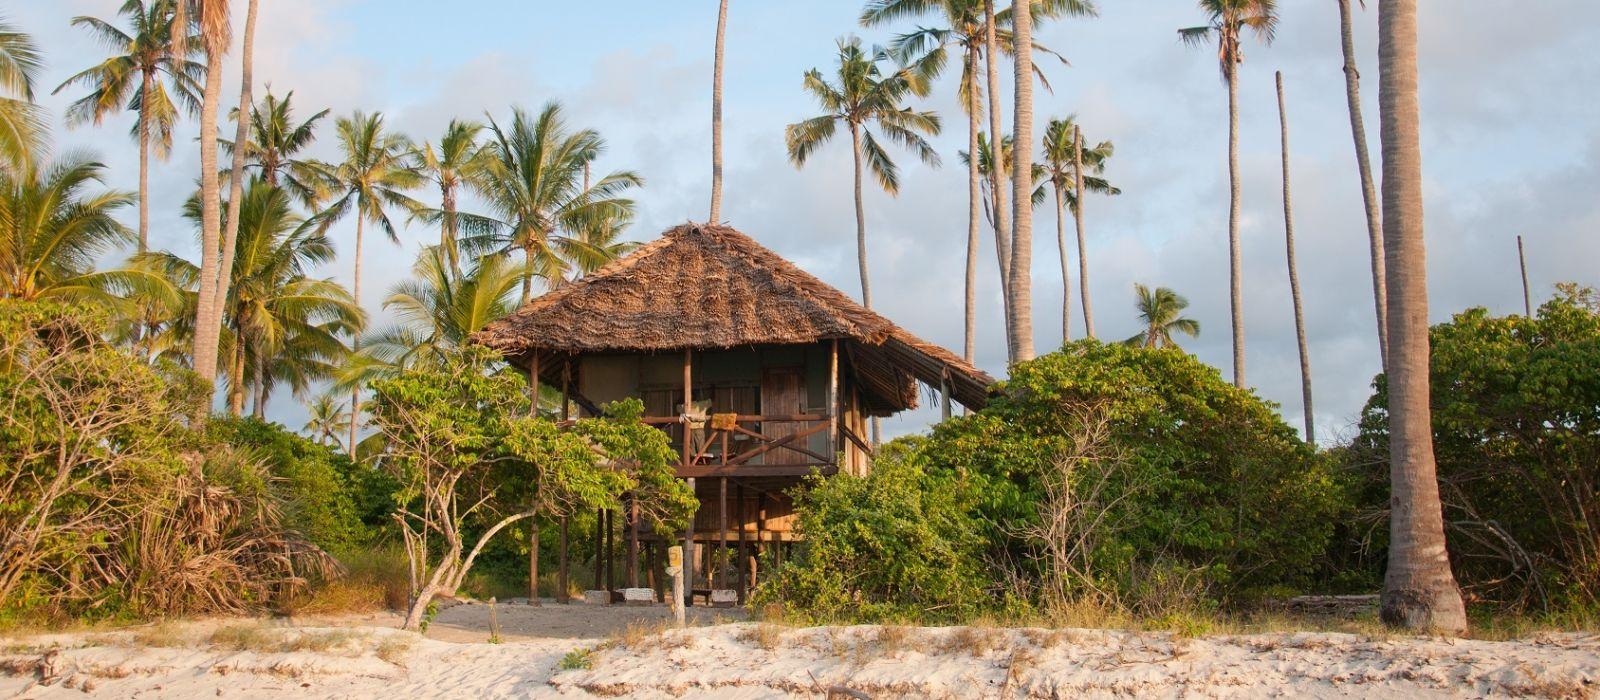 Destination Saadani Tanzania